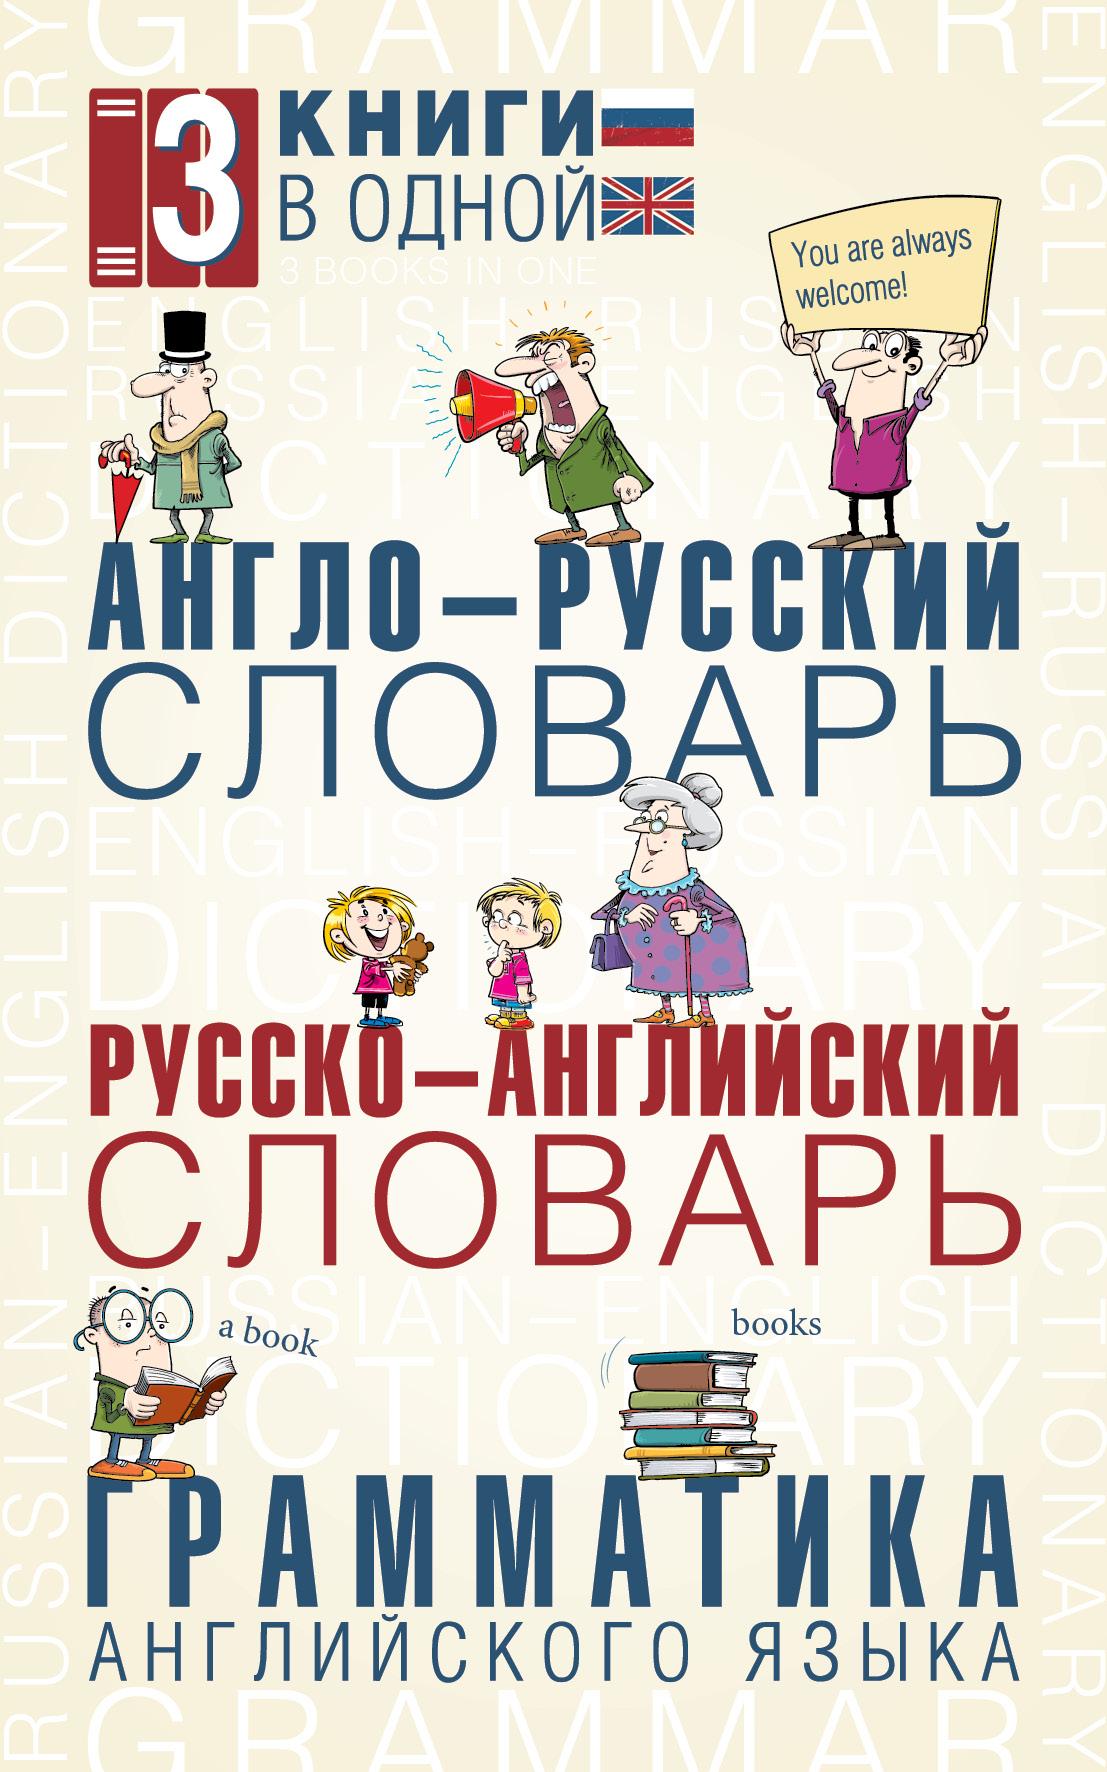 Грамматика Русского Языка Книга